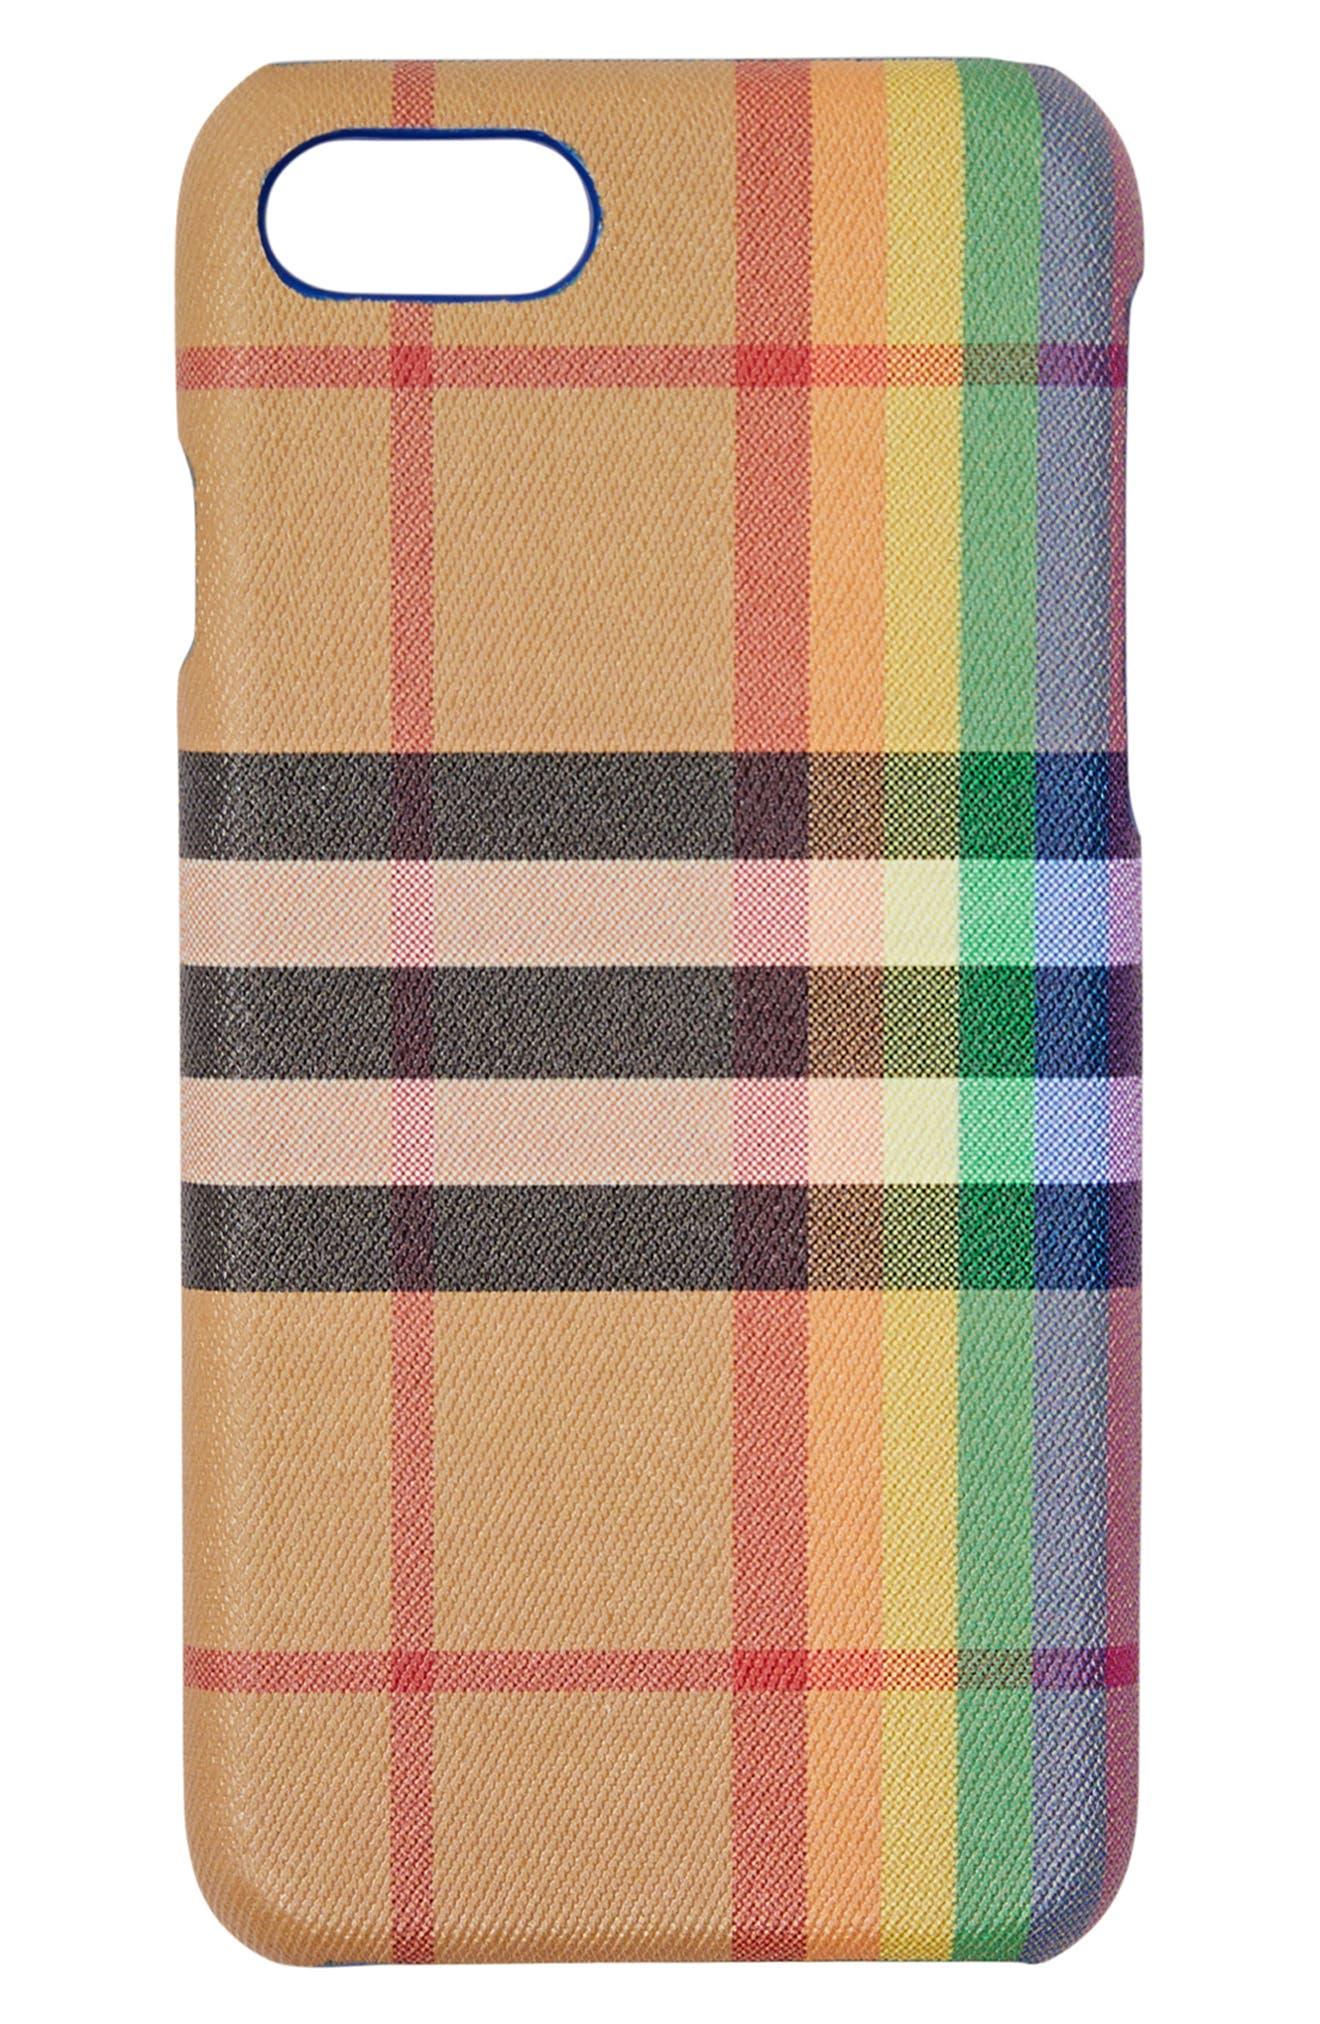 Vintage Check Rainbow iPhone 8 Case,                             Main thumbnail 1, color,                             250